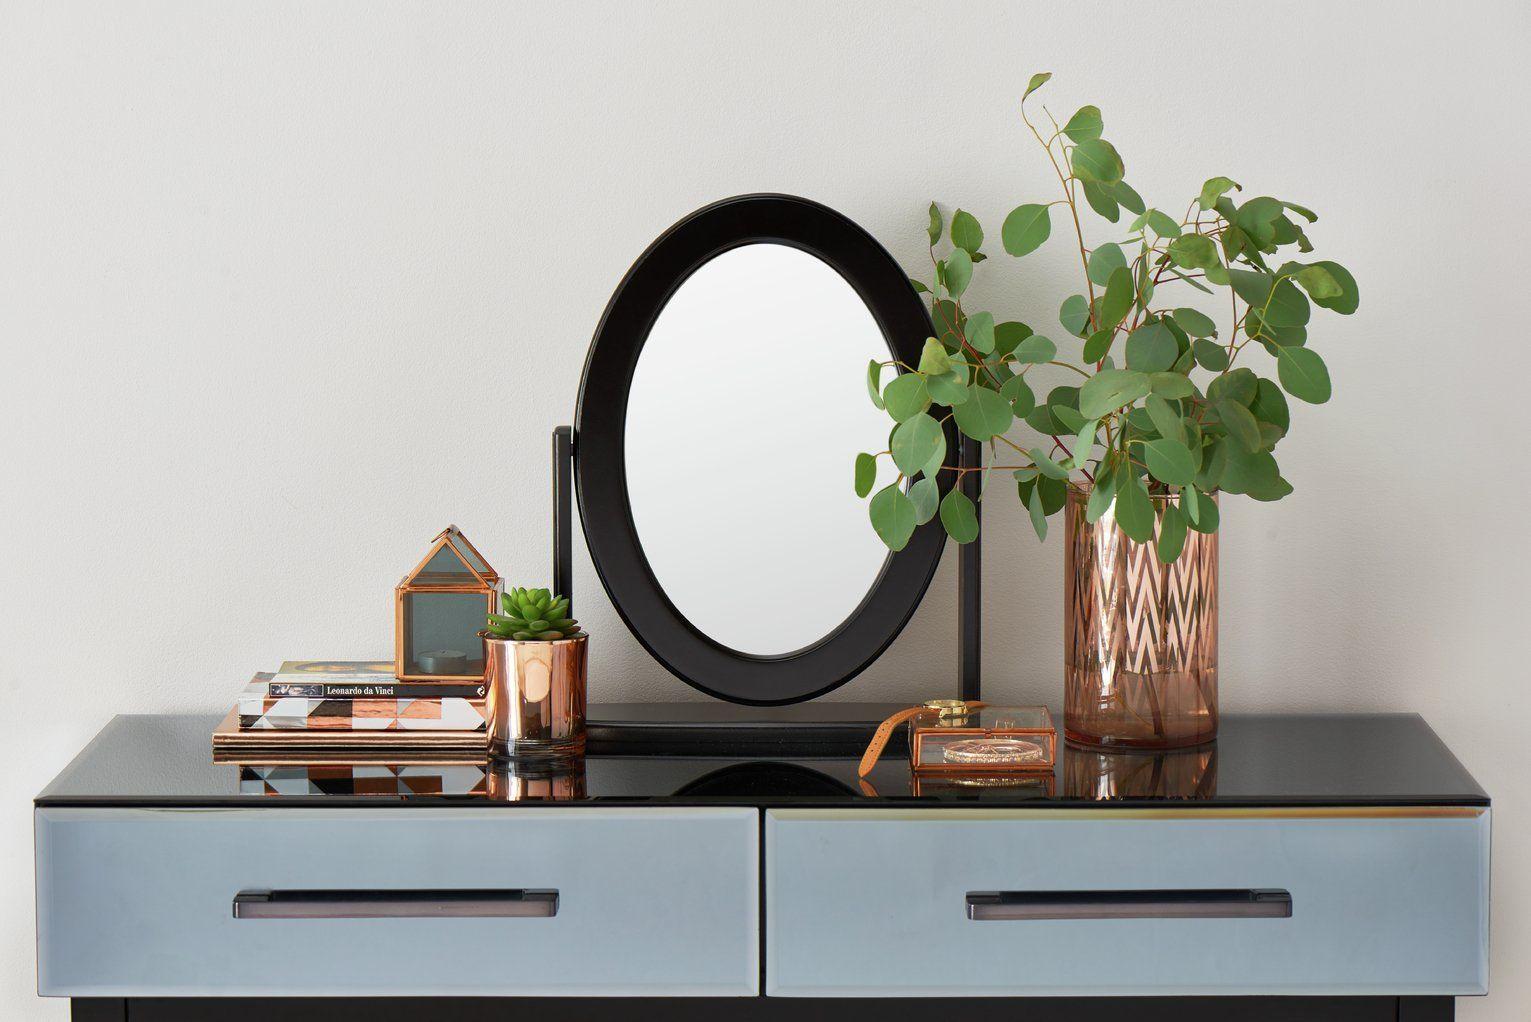 Argos Home Oval Dressing Table Mirror Black Argos Black Dressing Home Mirror Oval Table In 2020 Mirror Table Argos Home Dressing Table Mirror